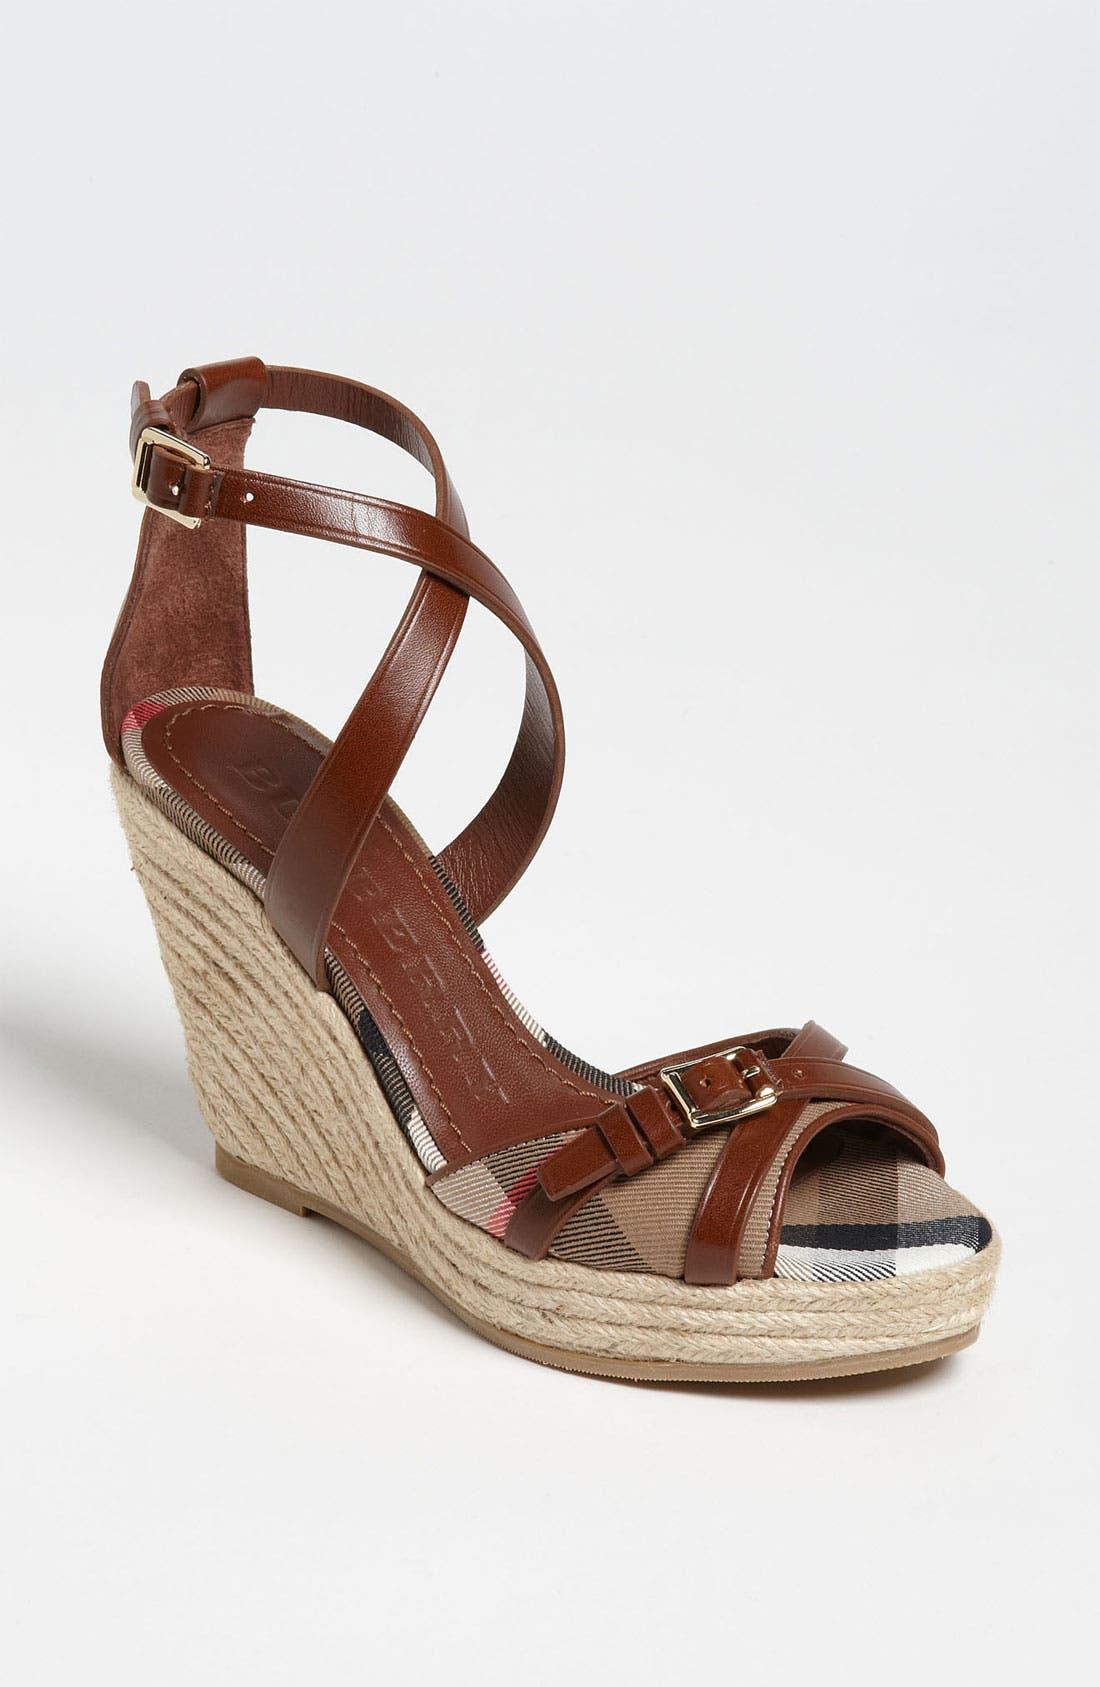 Main Image - Burberry 'Walden' Wedge Sandal